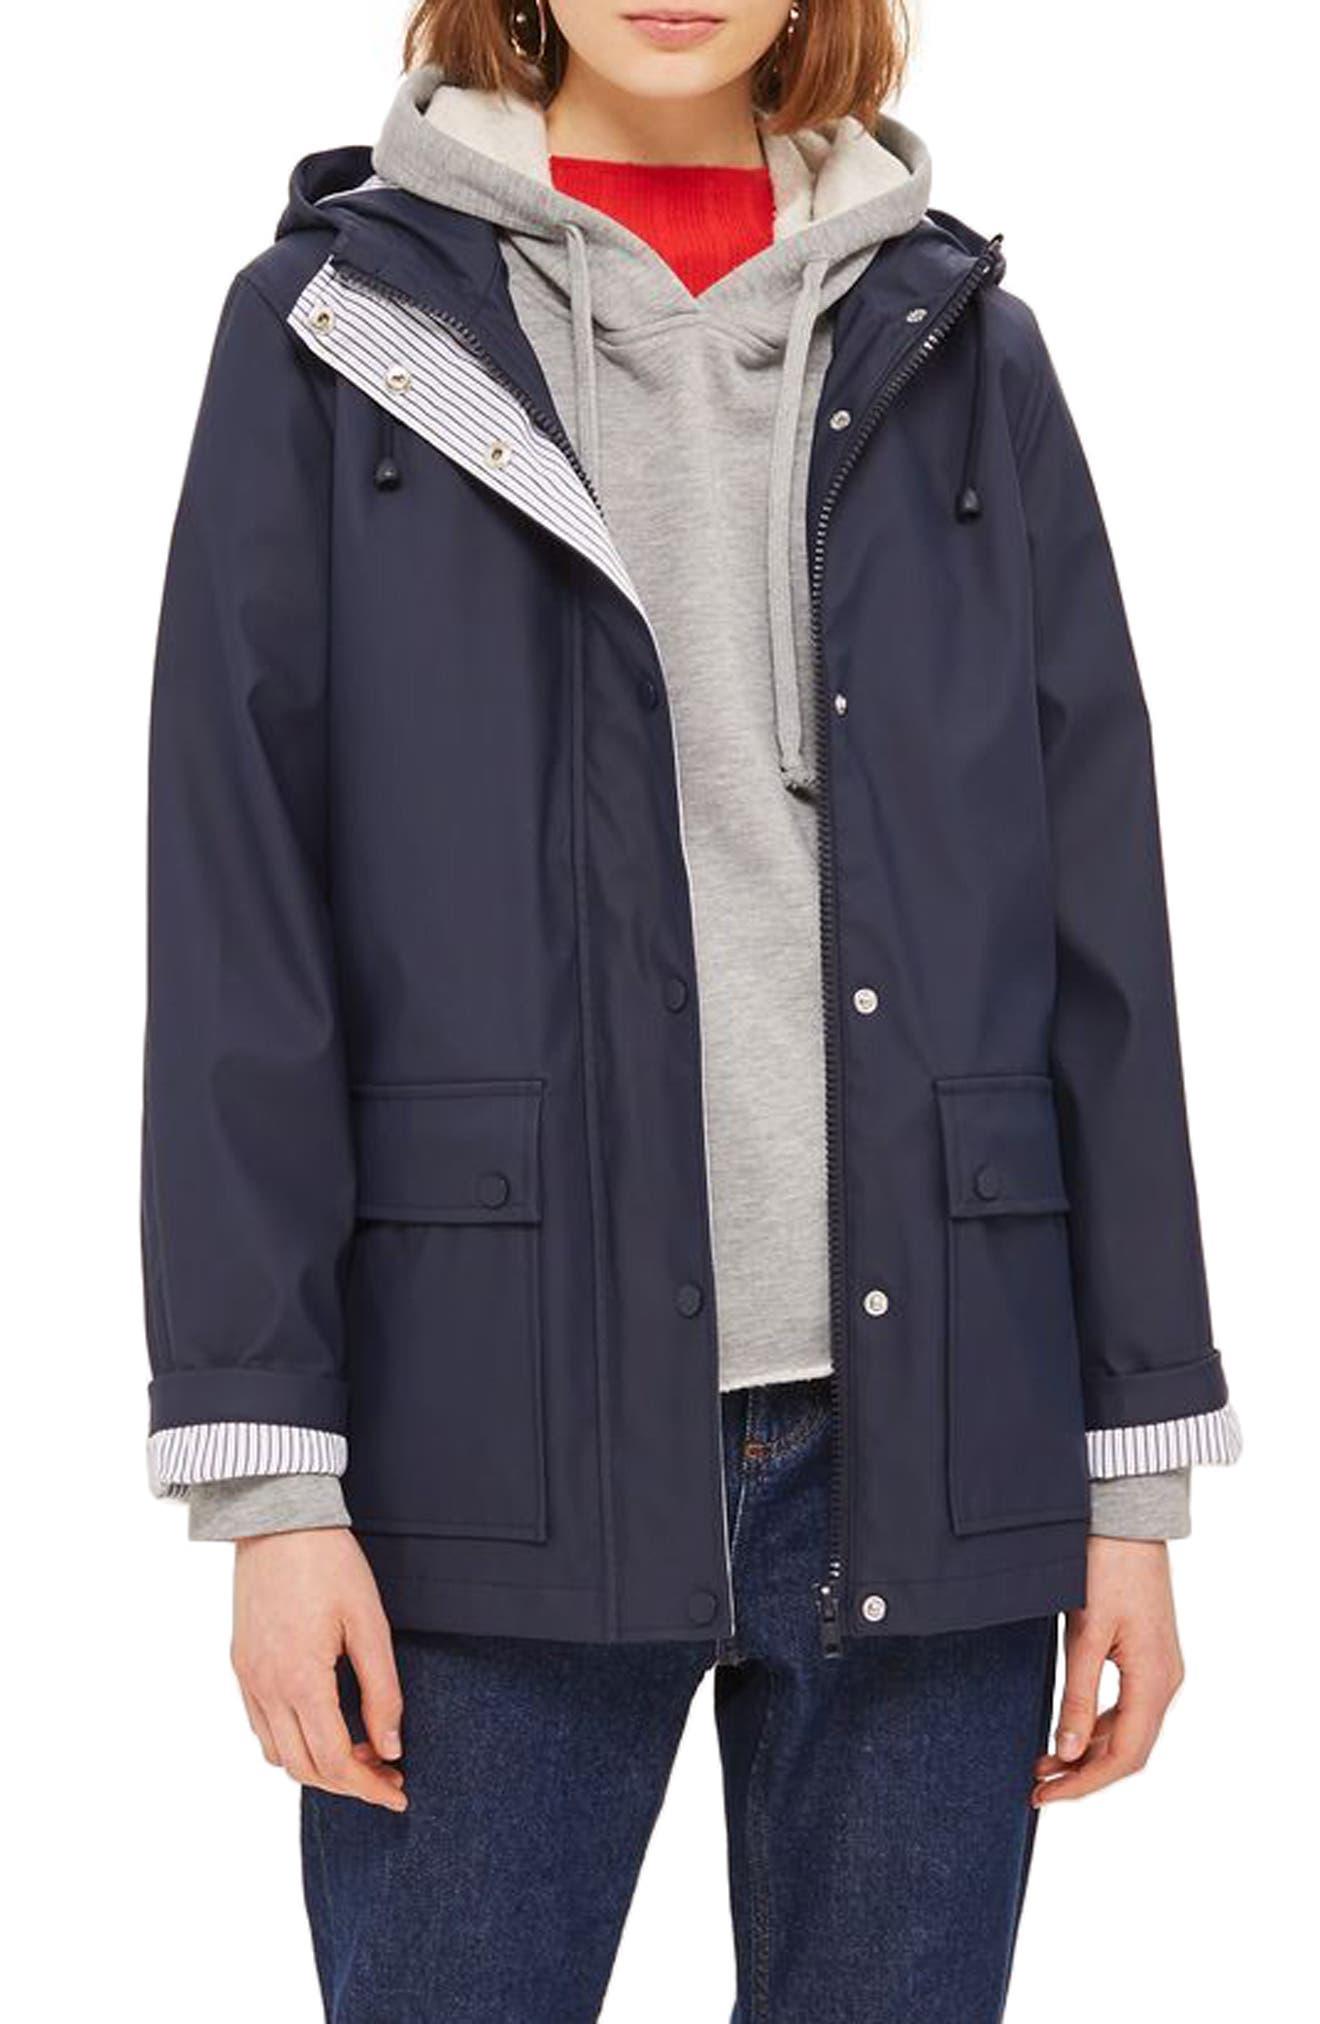 Topshop Maisie Rain Jacket